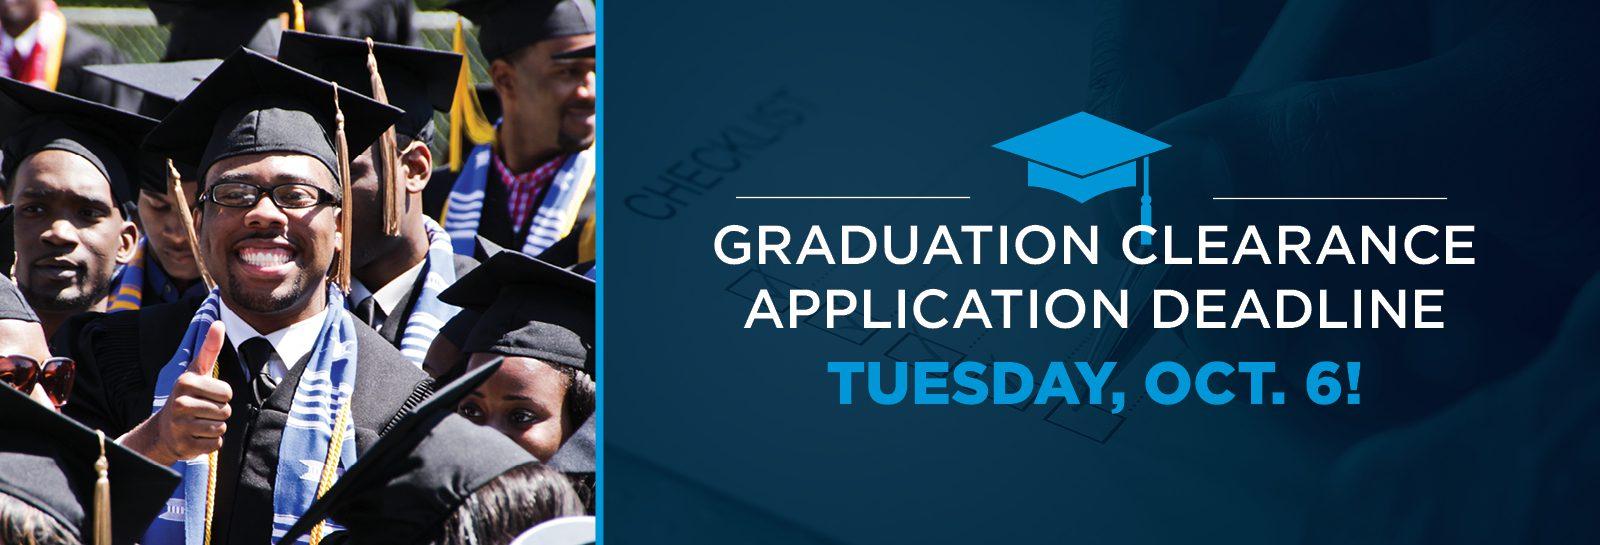 Graduation Clearance slider